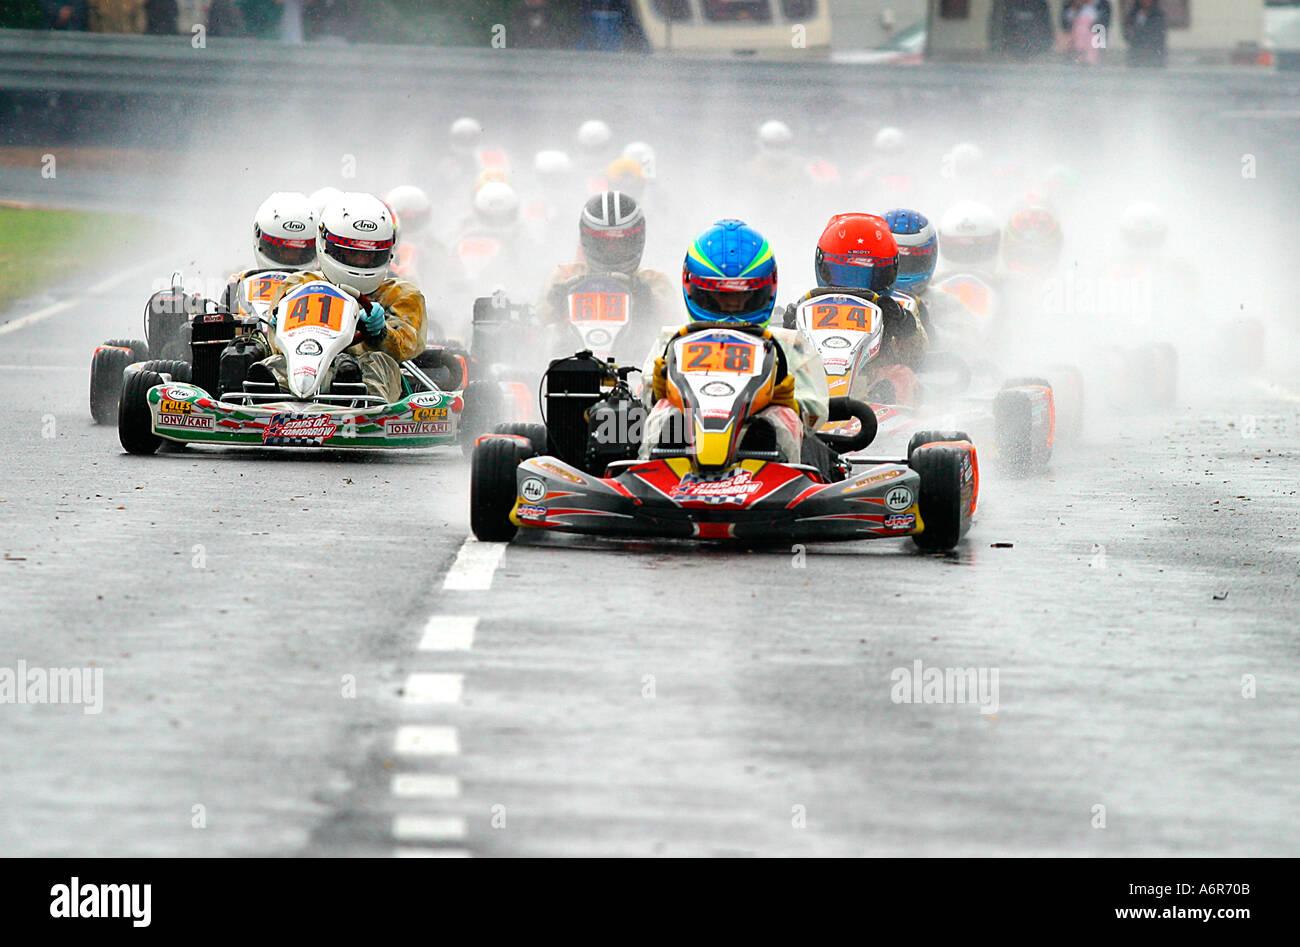 Mini Max Go Kart racing on wet race track Stock Photo: 2160394 - Alamy